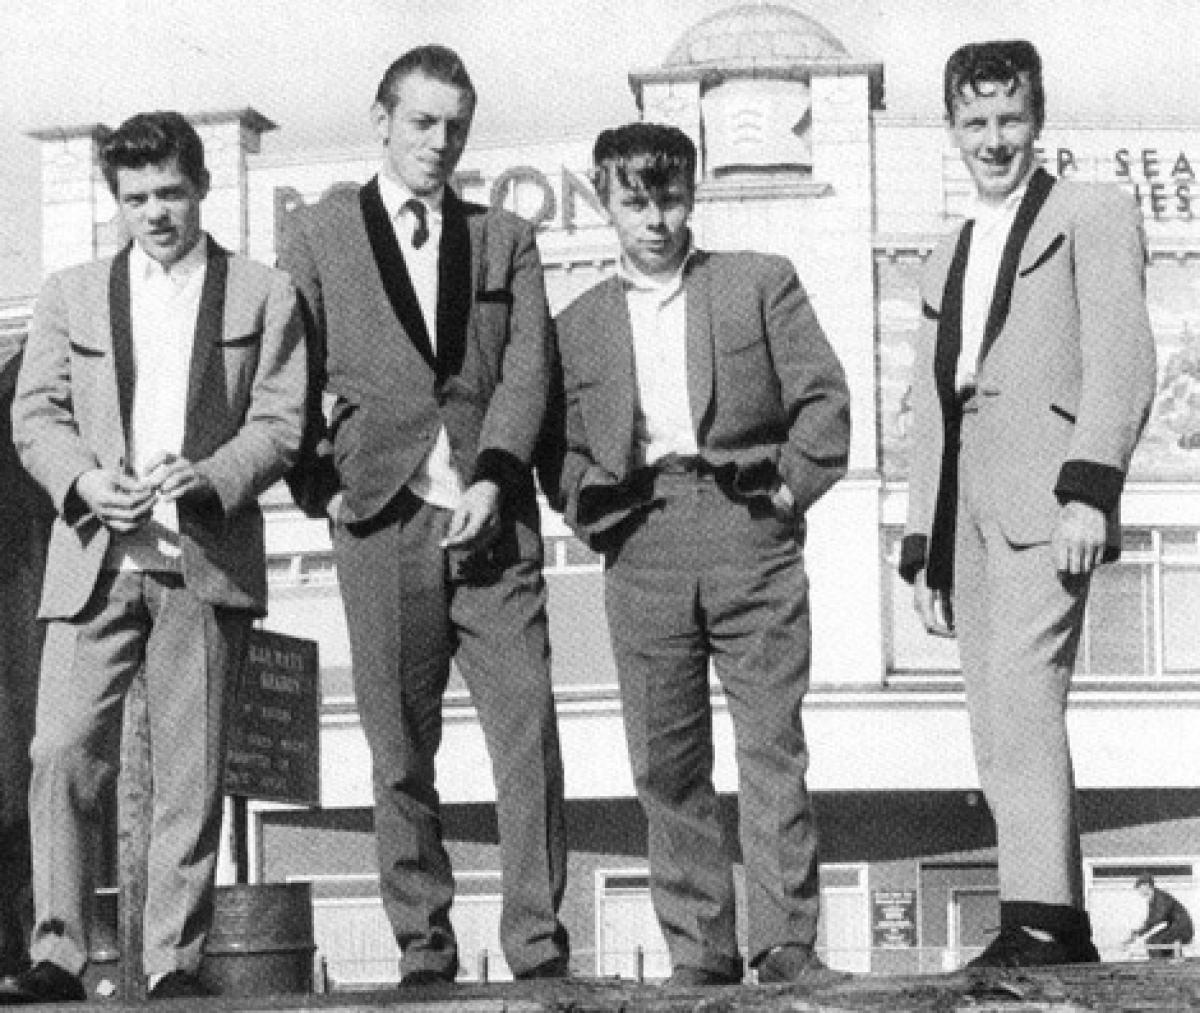 American Teen Boys in the 1950s (3)